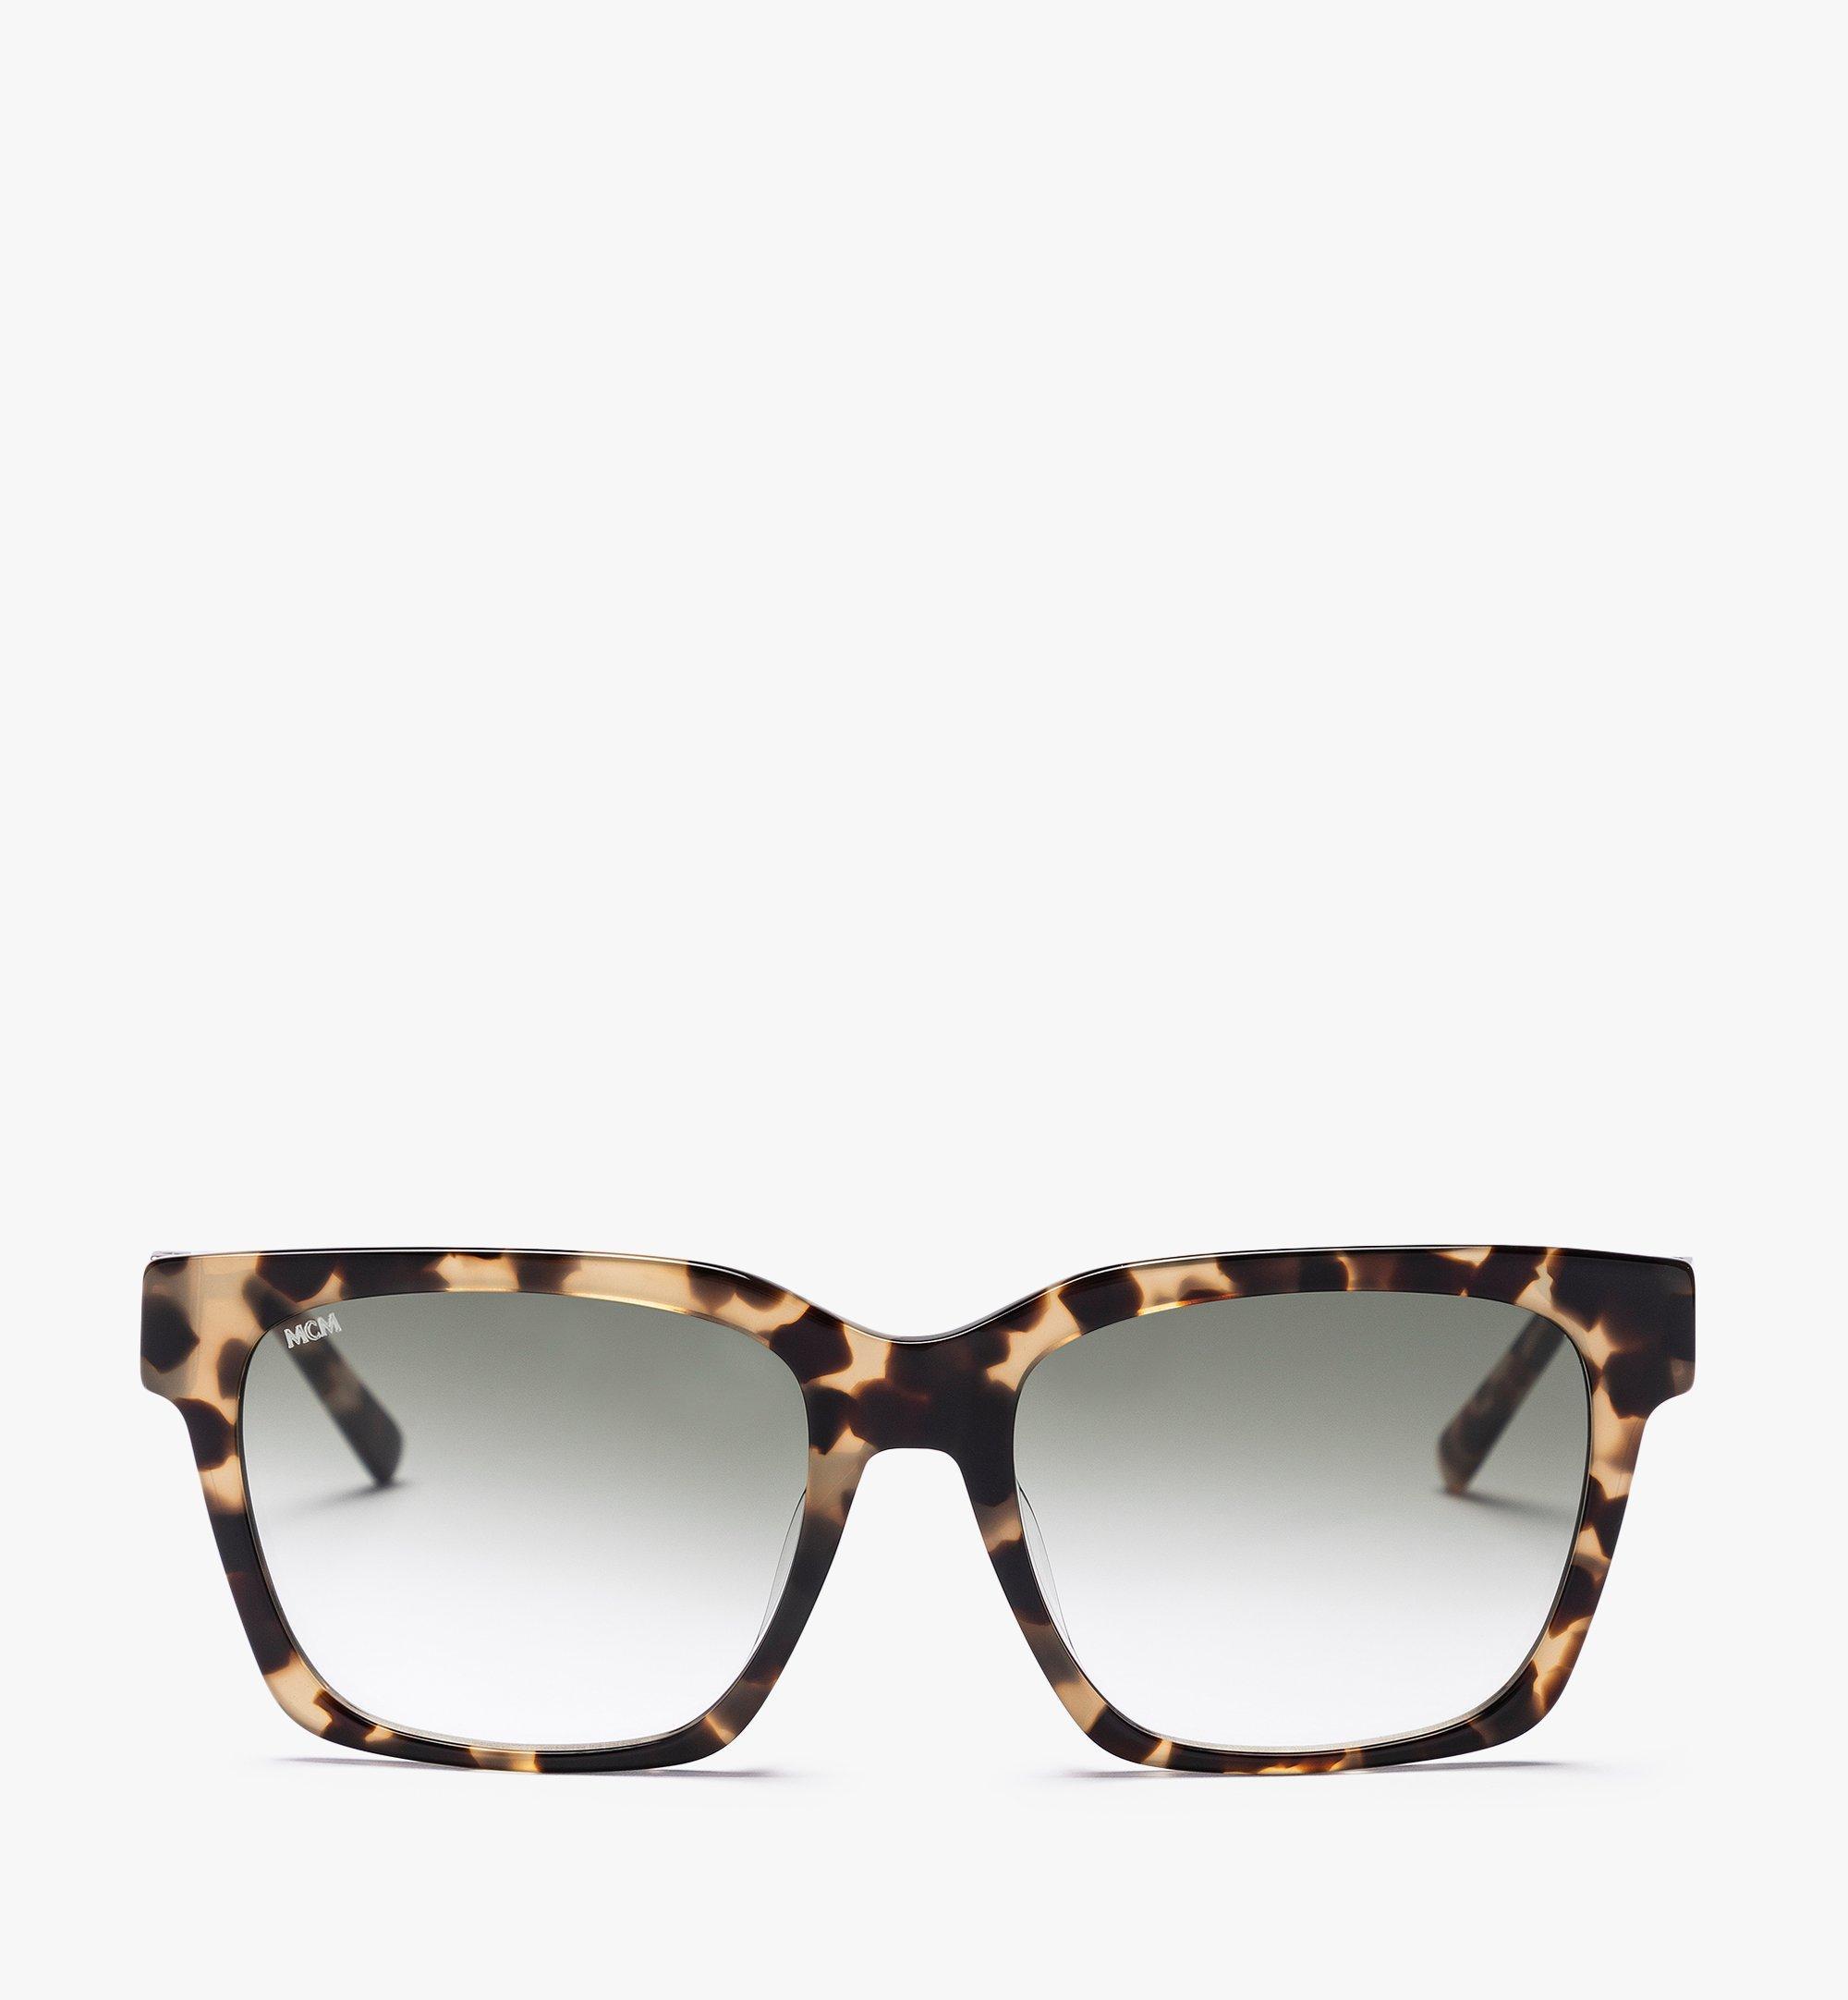 MCM MCM713SA Rectangular Sunglasses Brown MEGBAMM09NH001 Alternate View 1